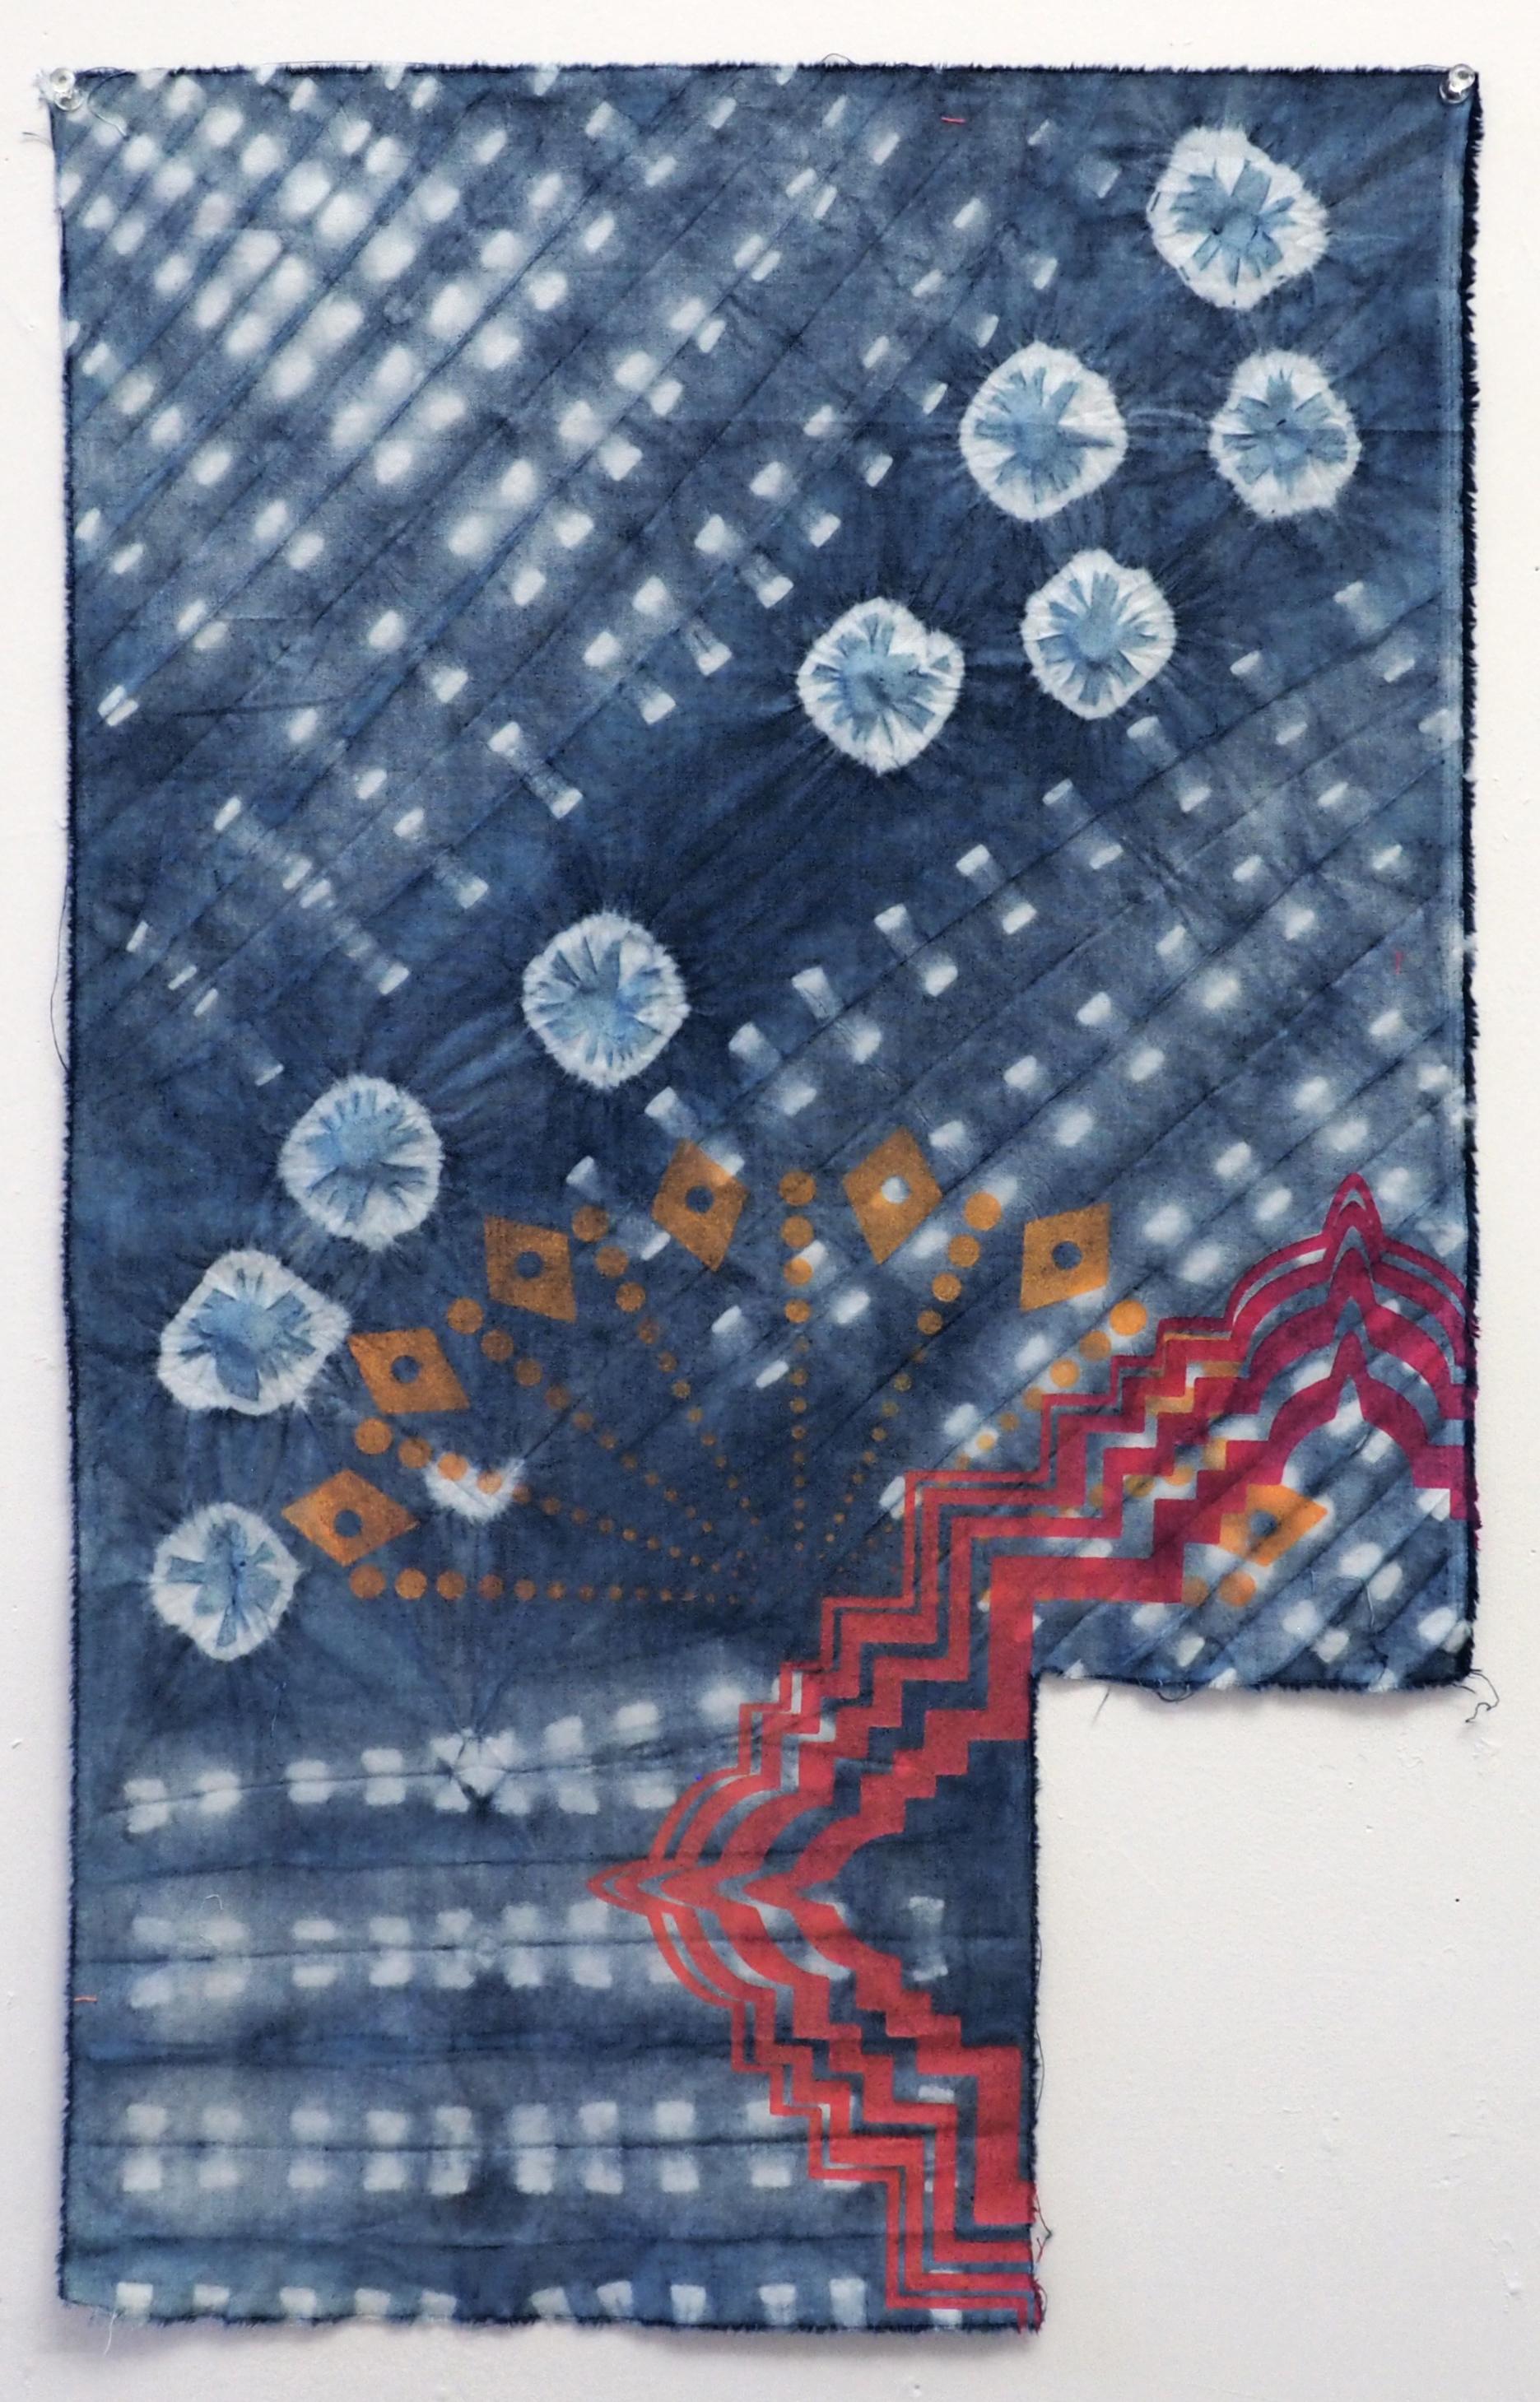 Radial Dimensions  Indigo shibori and screenprint on cotton 15.5 x 24.5 in 2017